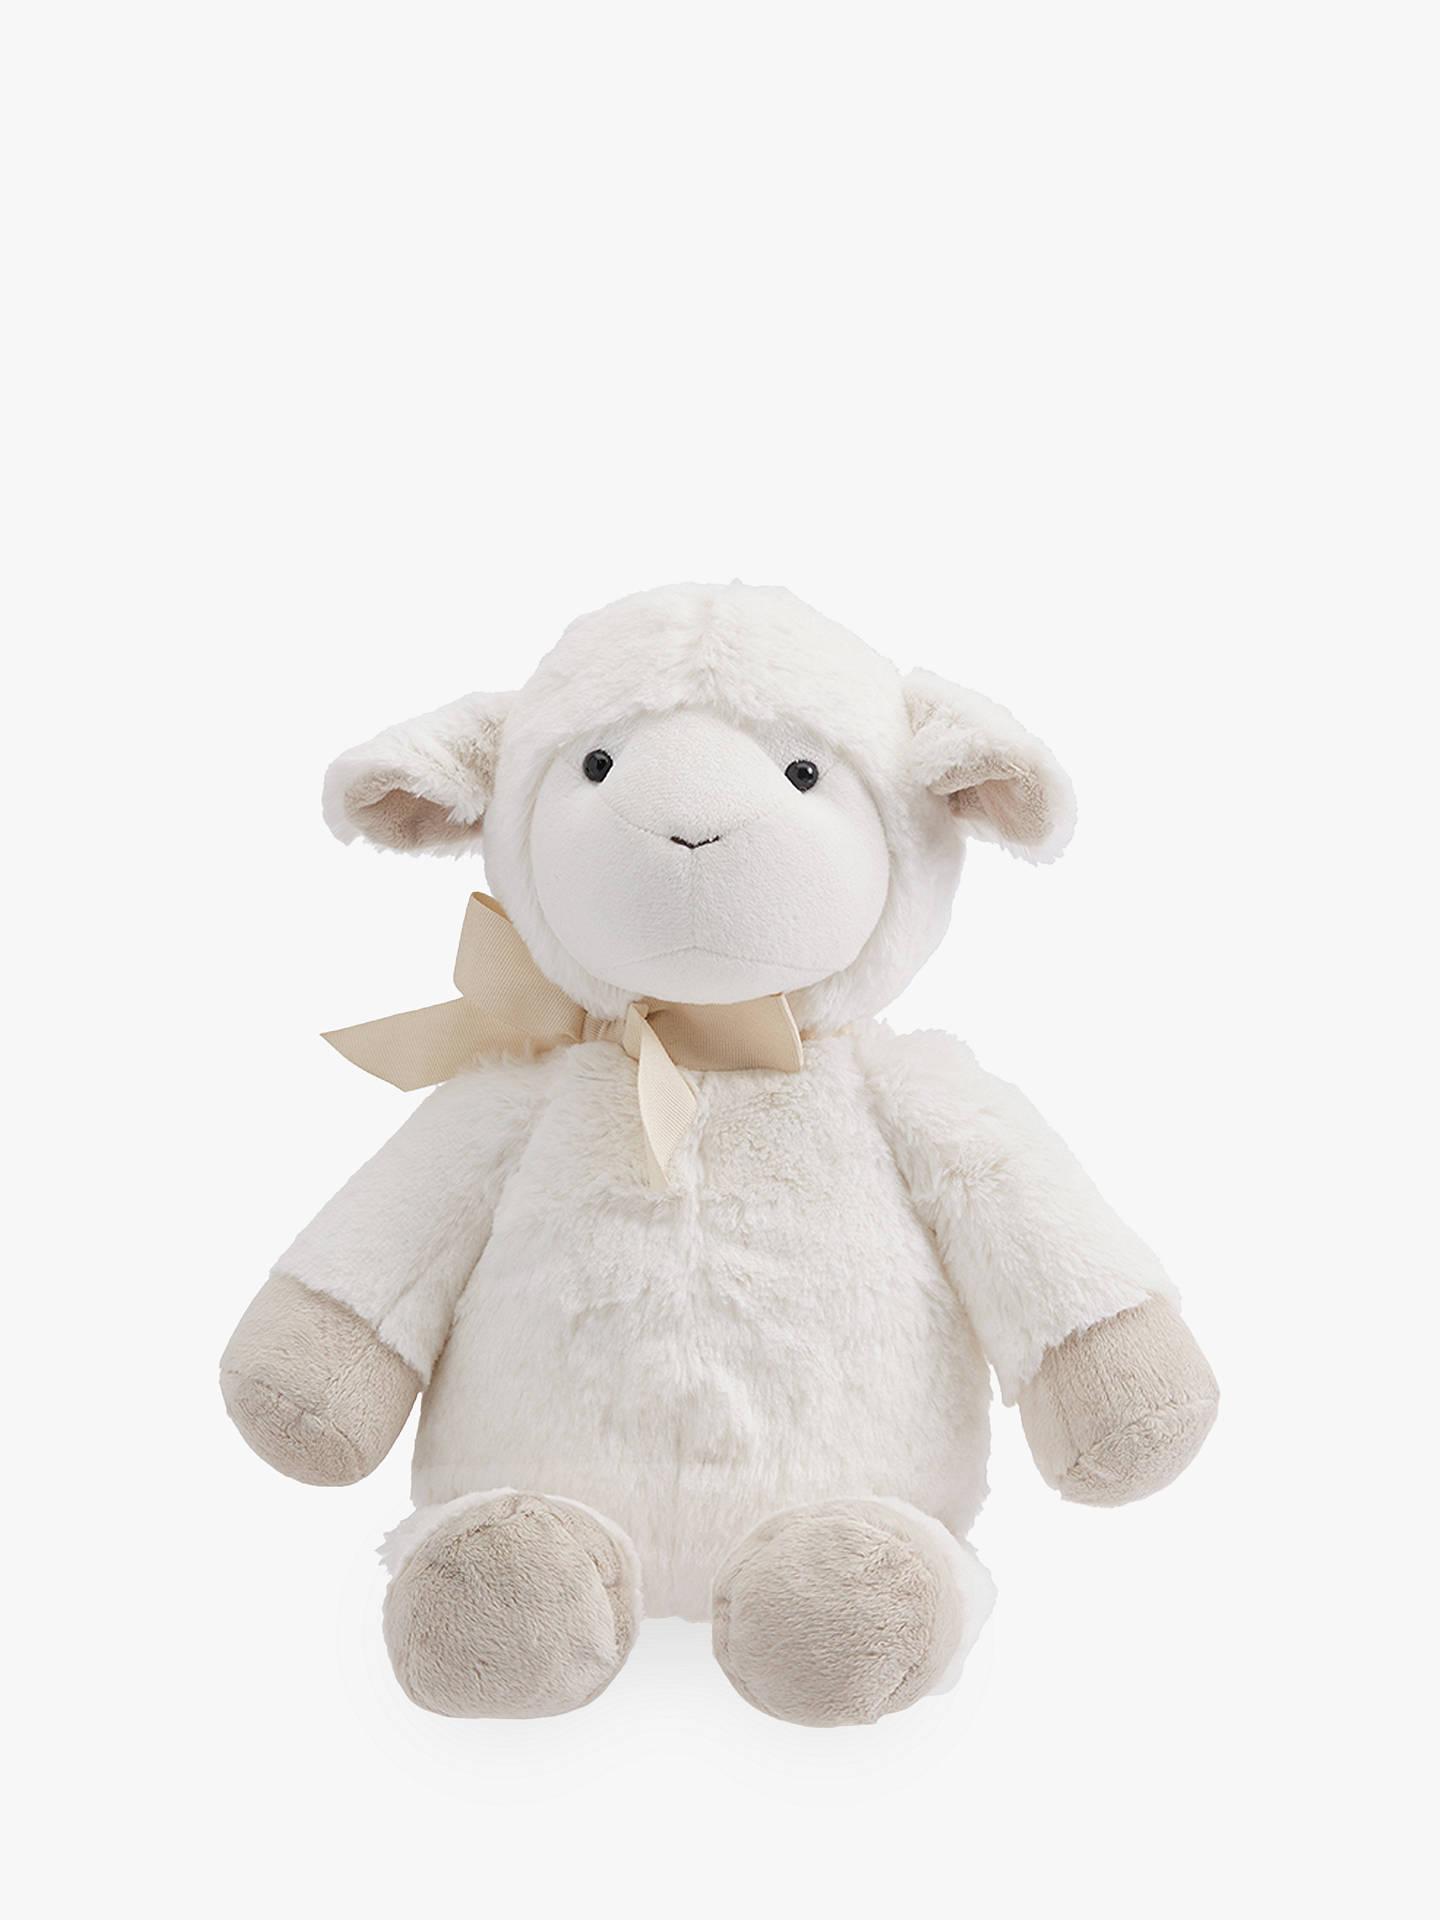 Pottery Barn Kids Plush Lamb Soft Toy Medium At John